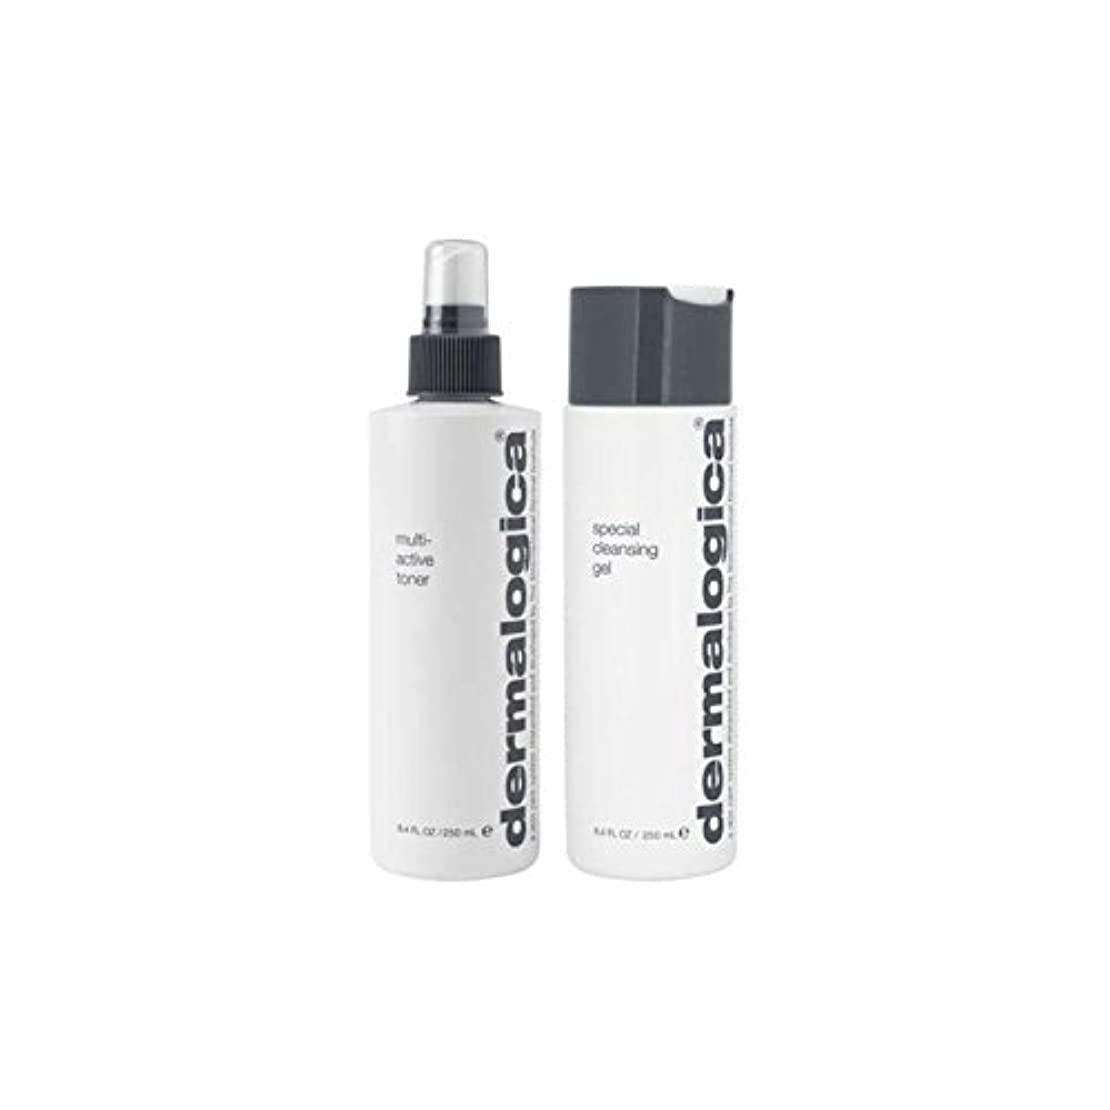 Dermalogica Cleanse & Tone Duo - Normal/Dry Skin (2 Products) (Pack of 6) - ダーマロジカクレンジング&トーンデュオ - ノーマル/ドライスキン(2製品) x6 [並行輸入品]